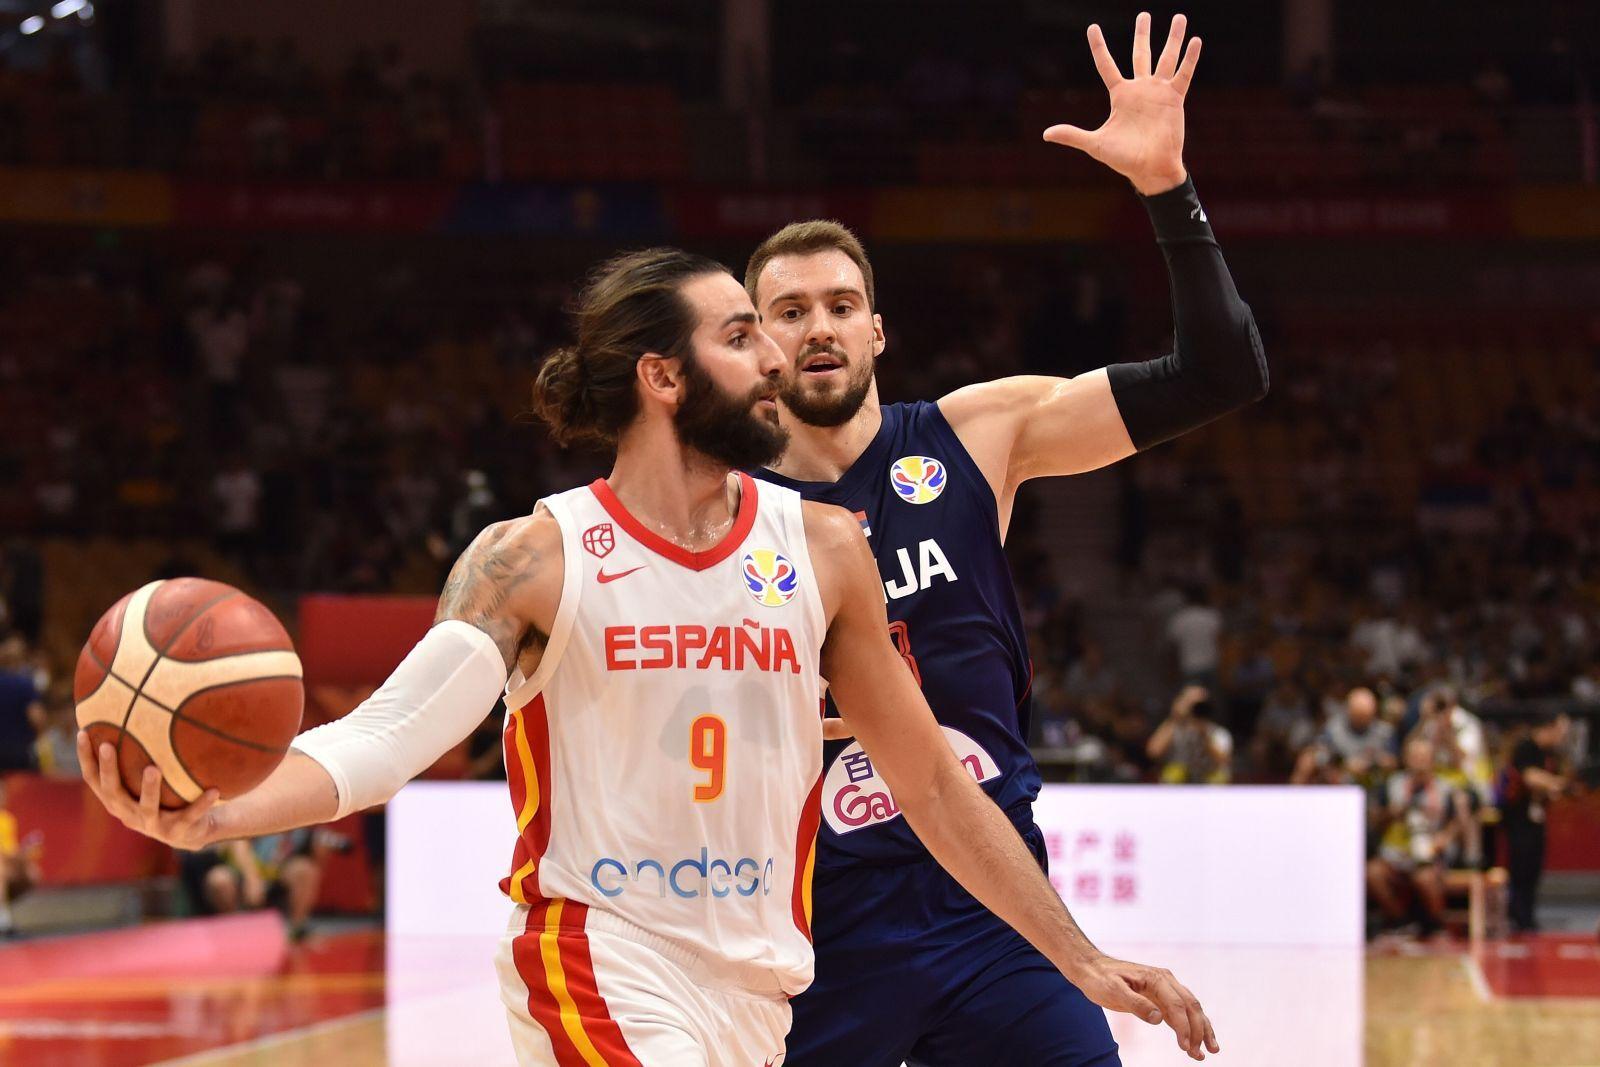 Phoenix Suns: Ricky Rubio's FIBA World Cup MVP performance impact on Suns